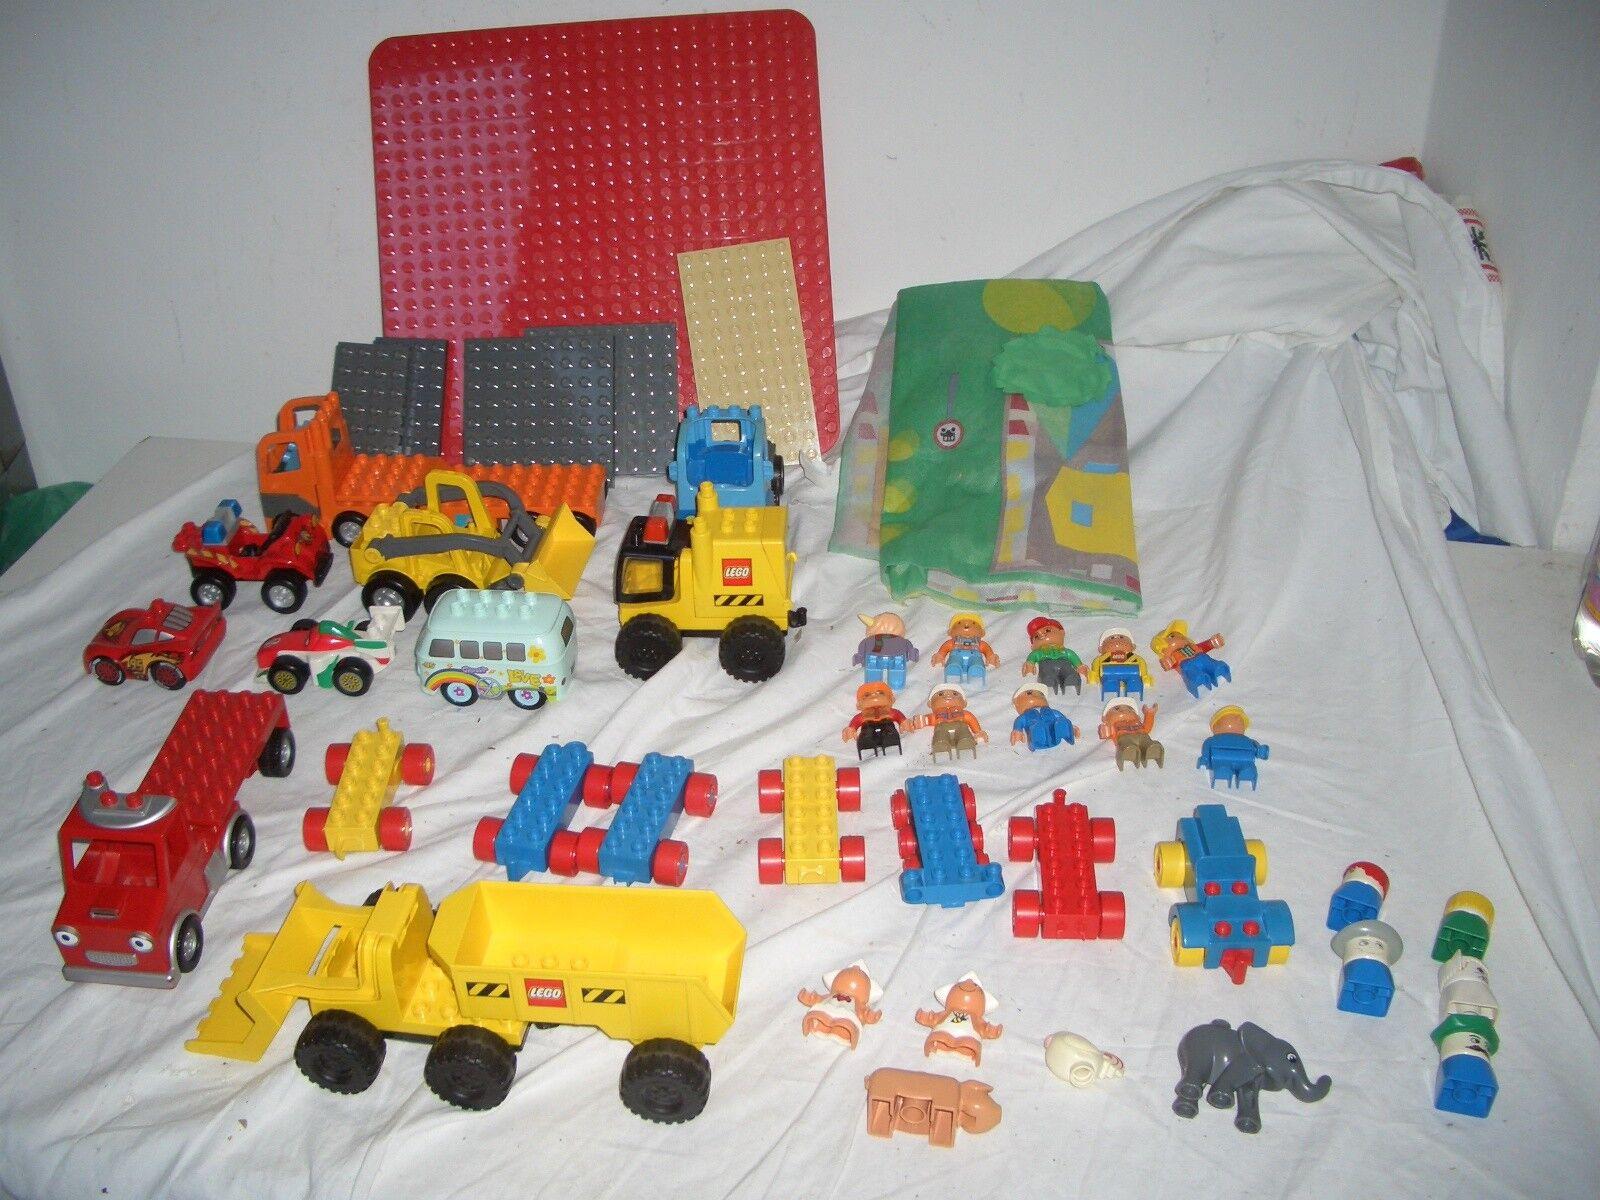 LEGO - DUPLO - gemischte Kiloware ca. 9 Kilo mit Platte Fahrzeugen Figuren